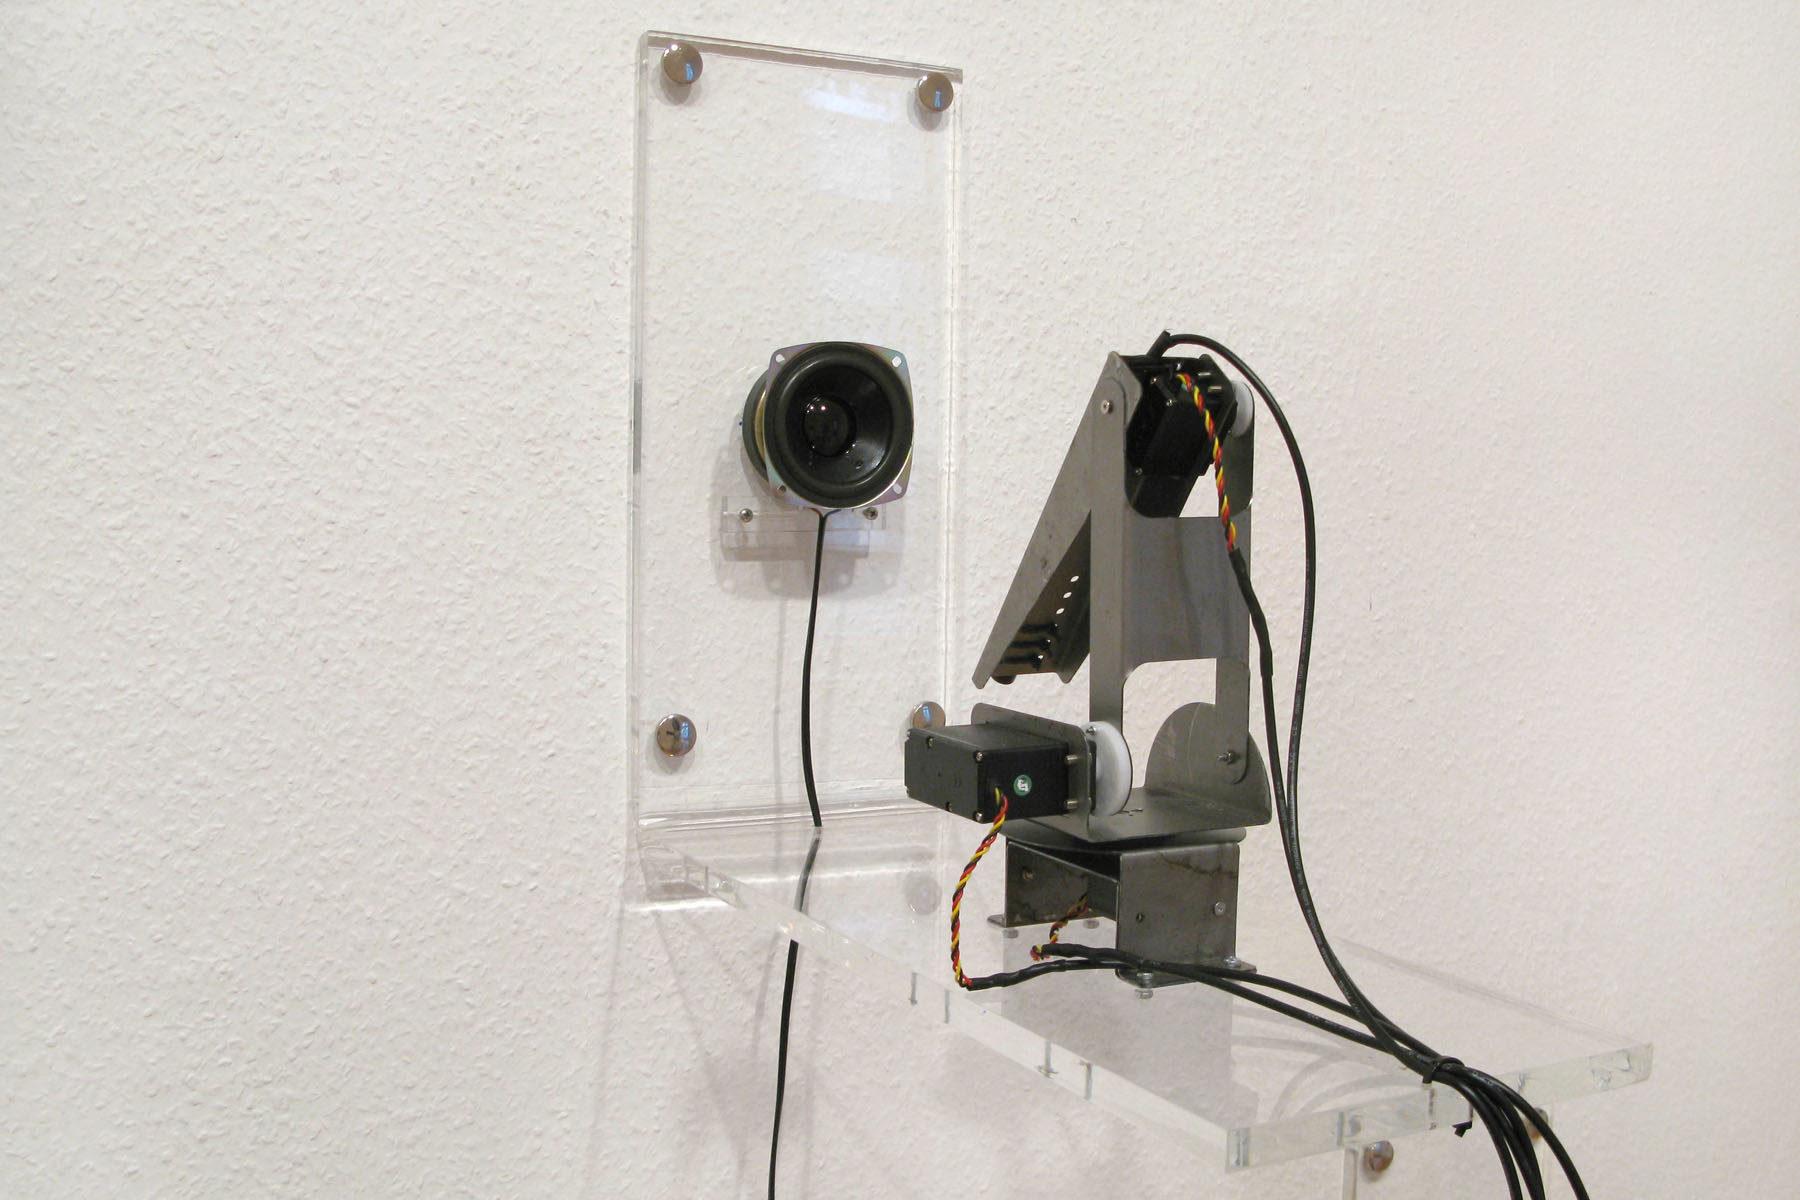 Roberto Pugliese, Equilibrium (det.), 2011, installation view at Galerie Mario Mazzoli, Berlin